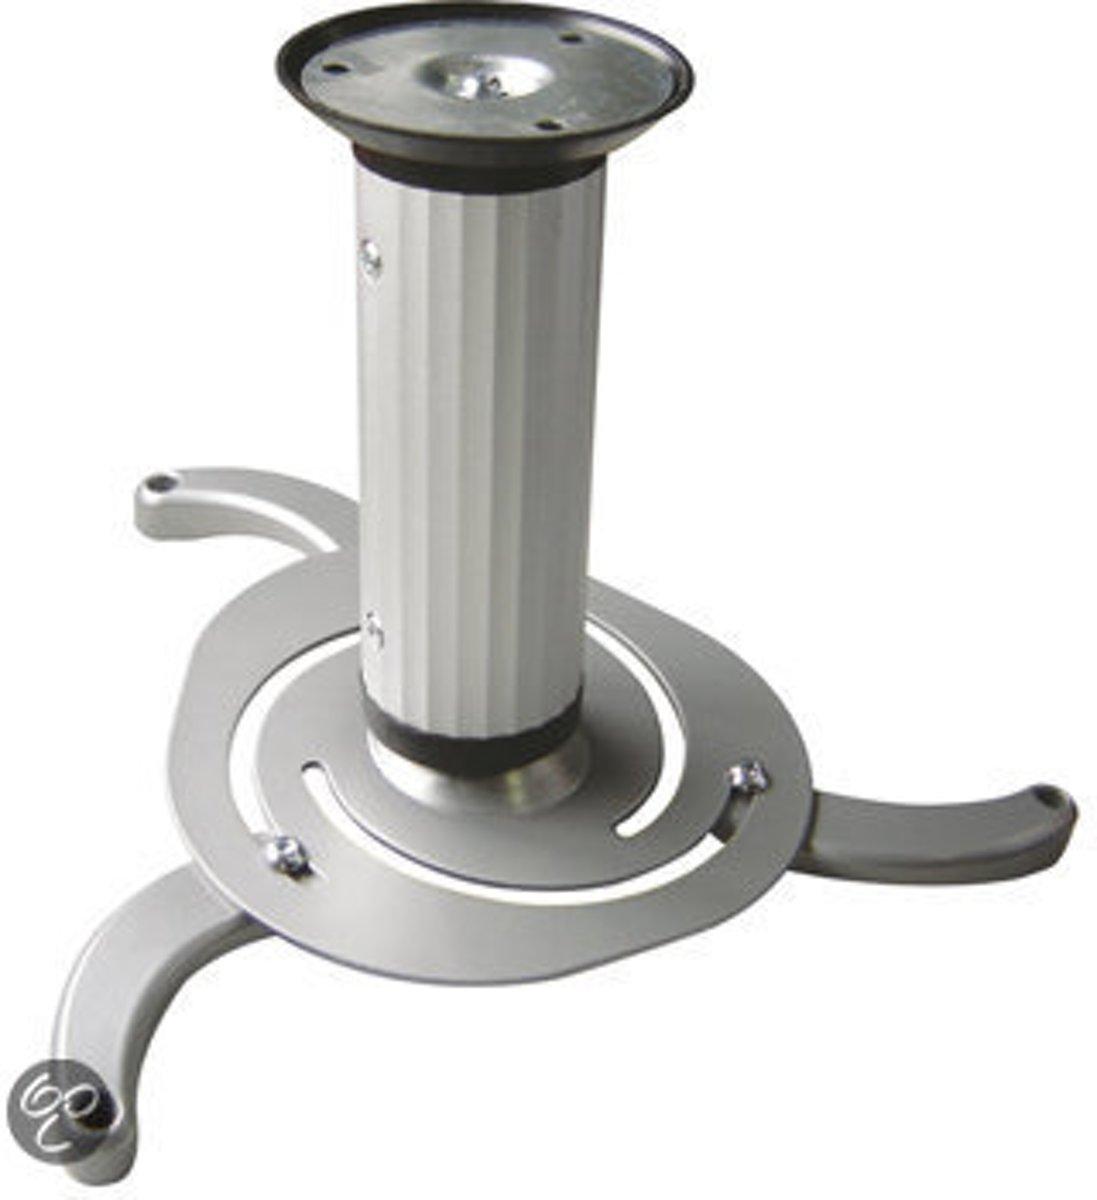 HQ, Beamer Plafondbeugel (max. 10 kg) (Zilver) kopen